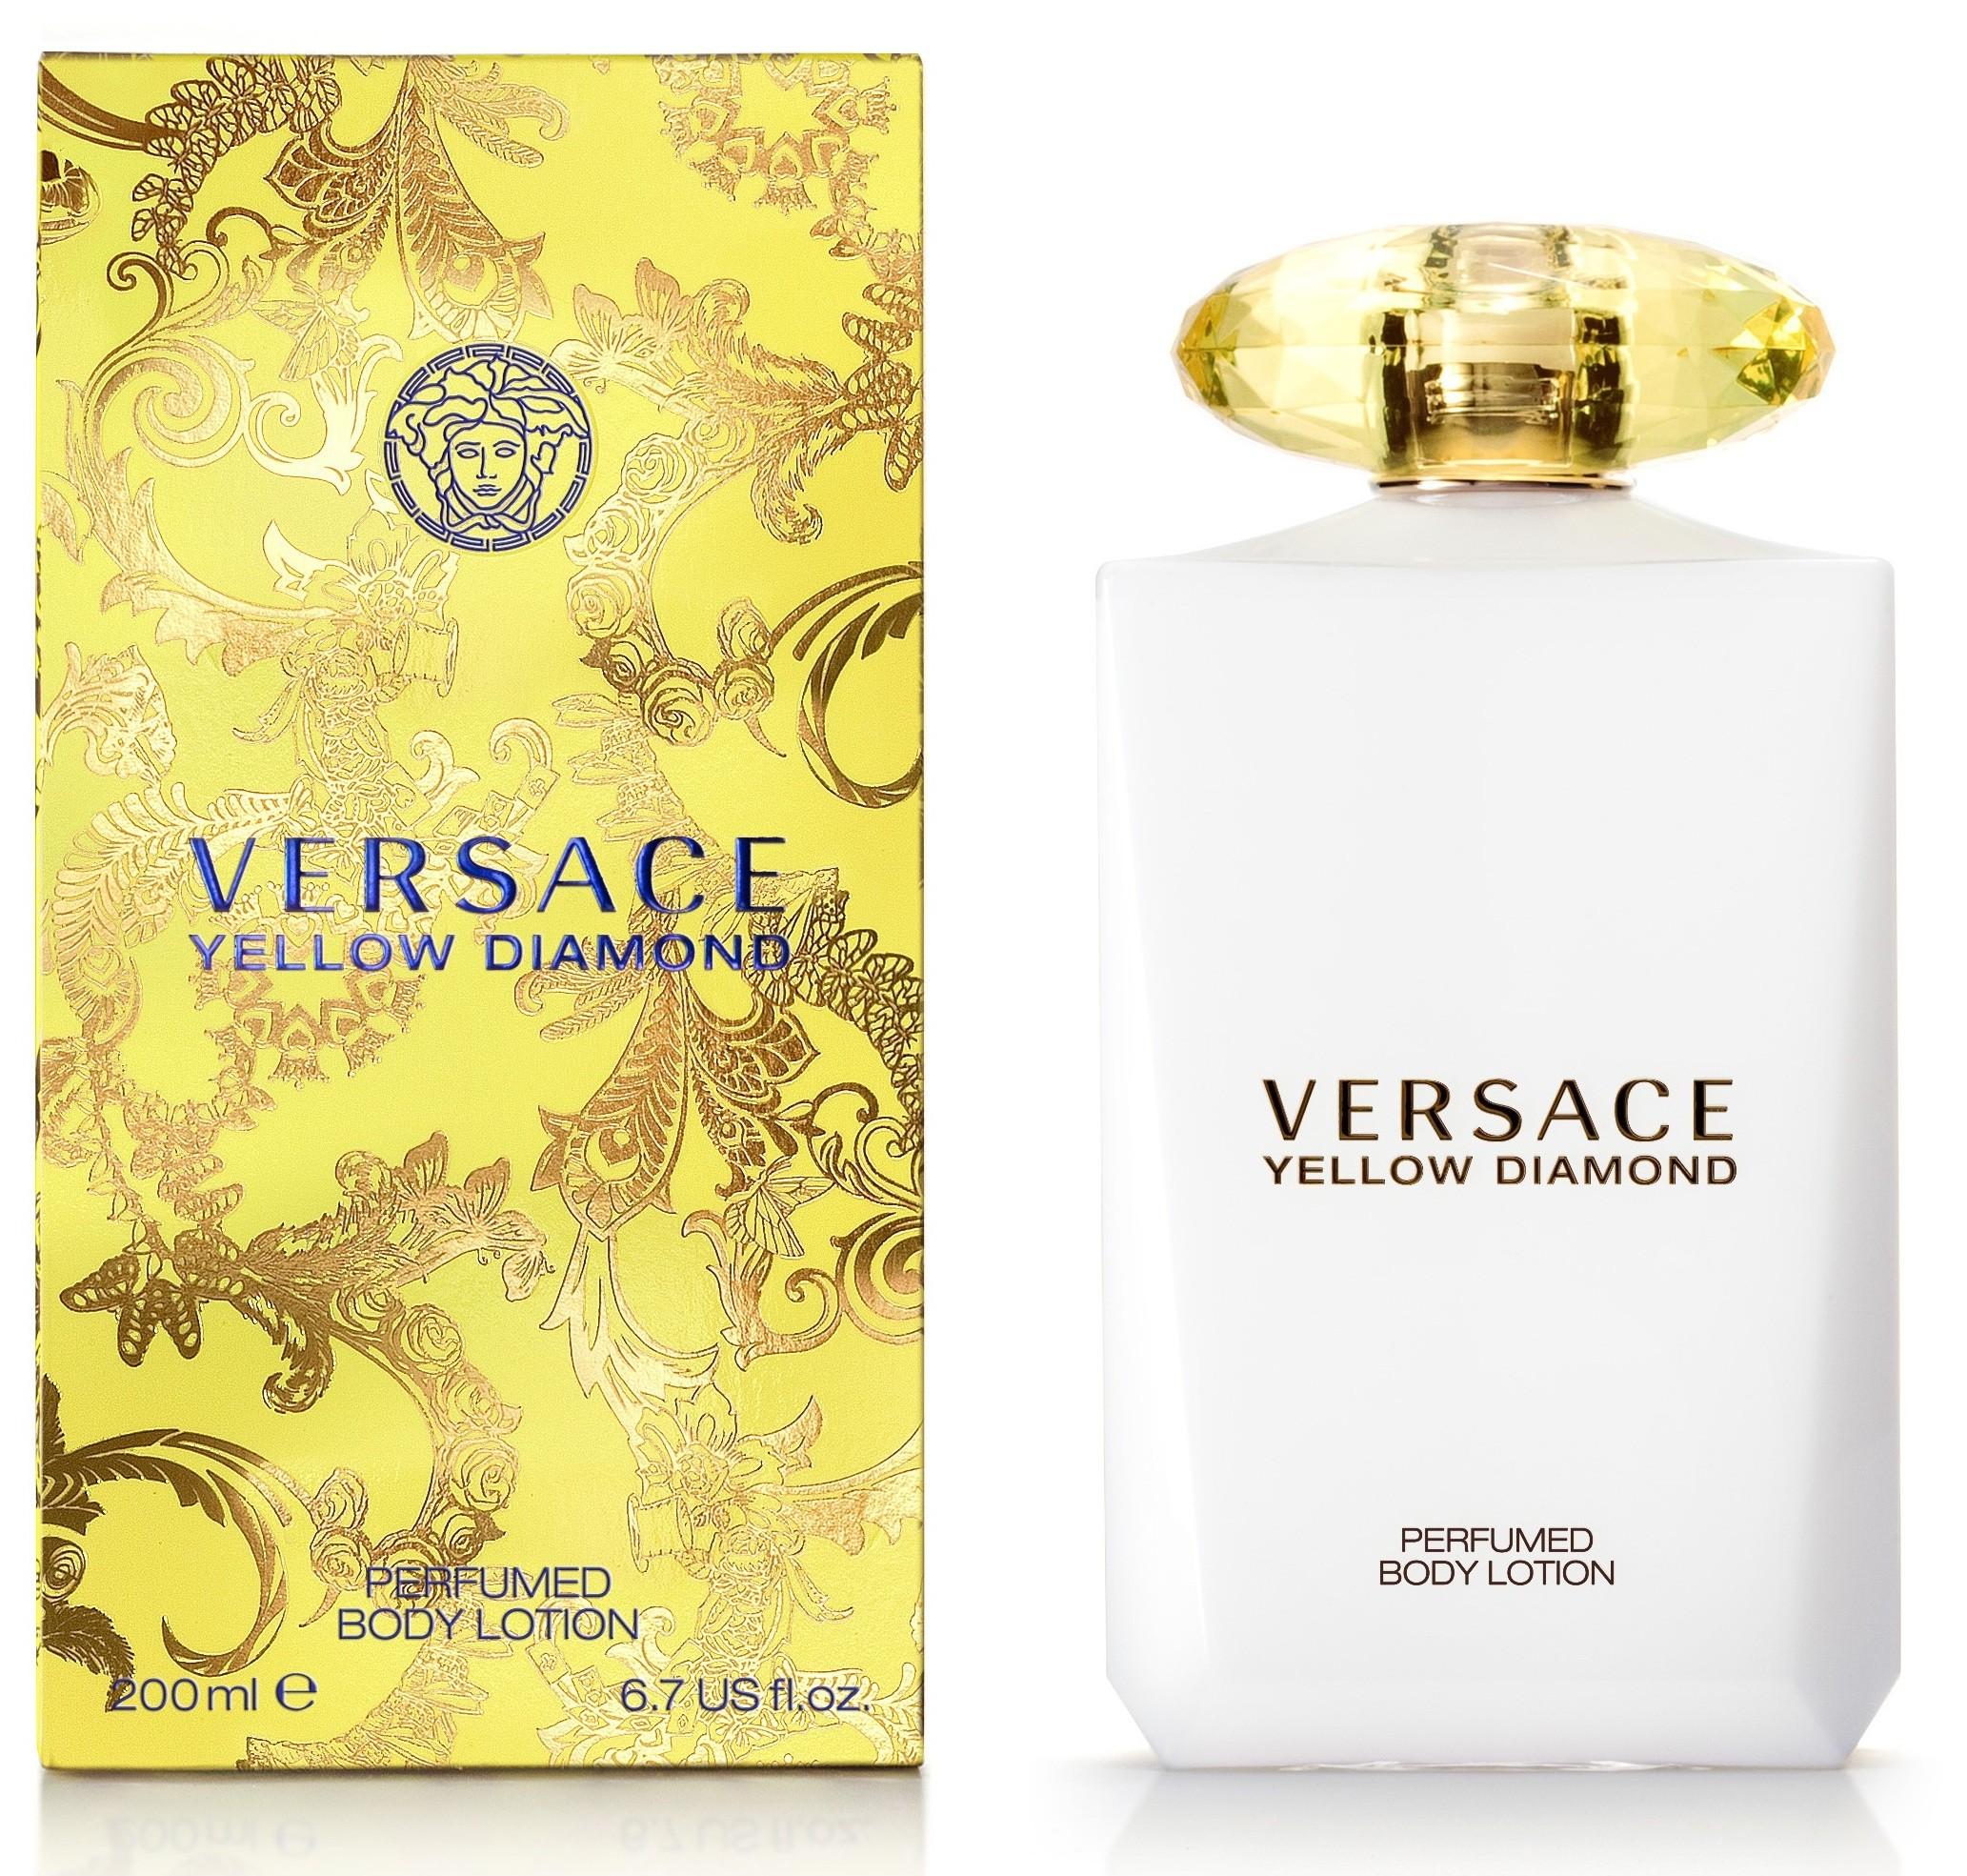 Versace Yellow Diamond аромат для женщин